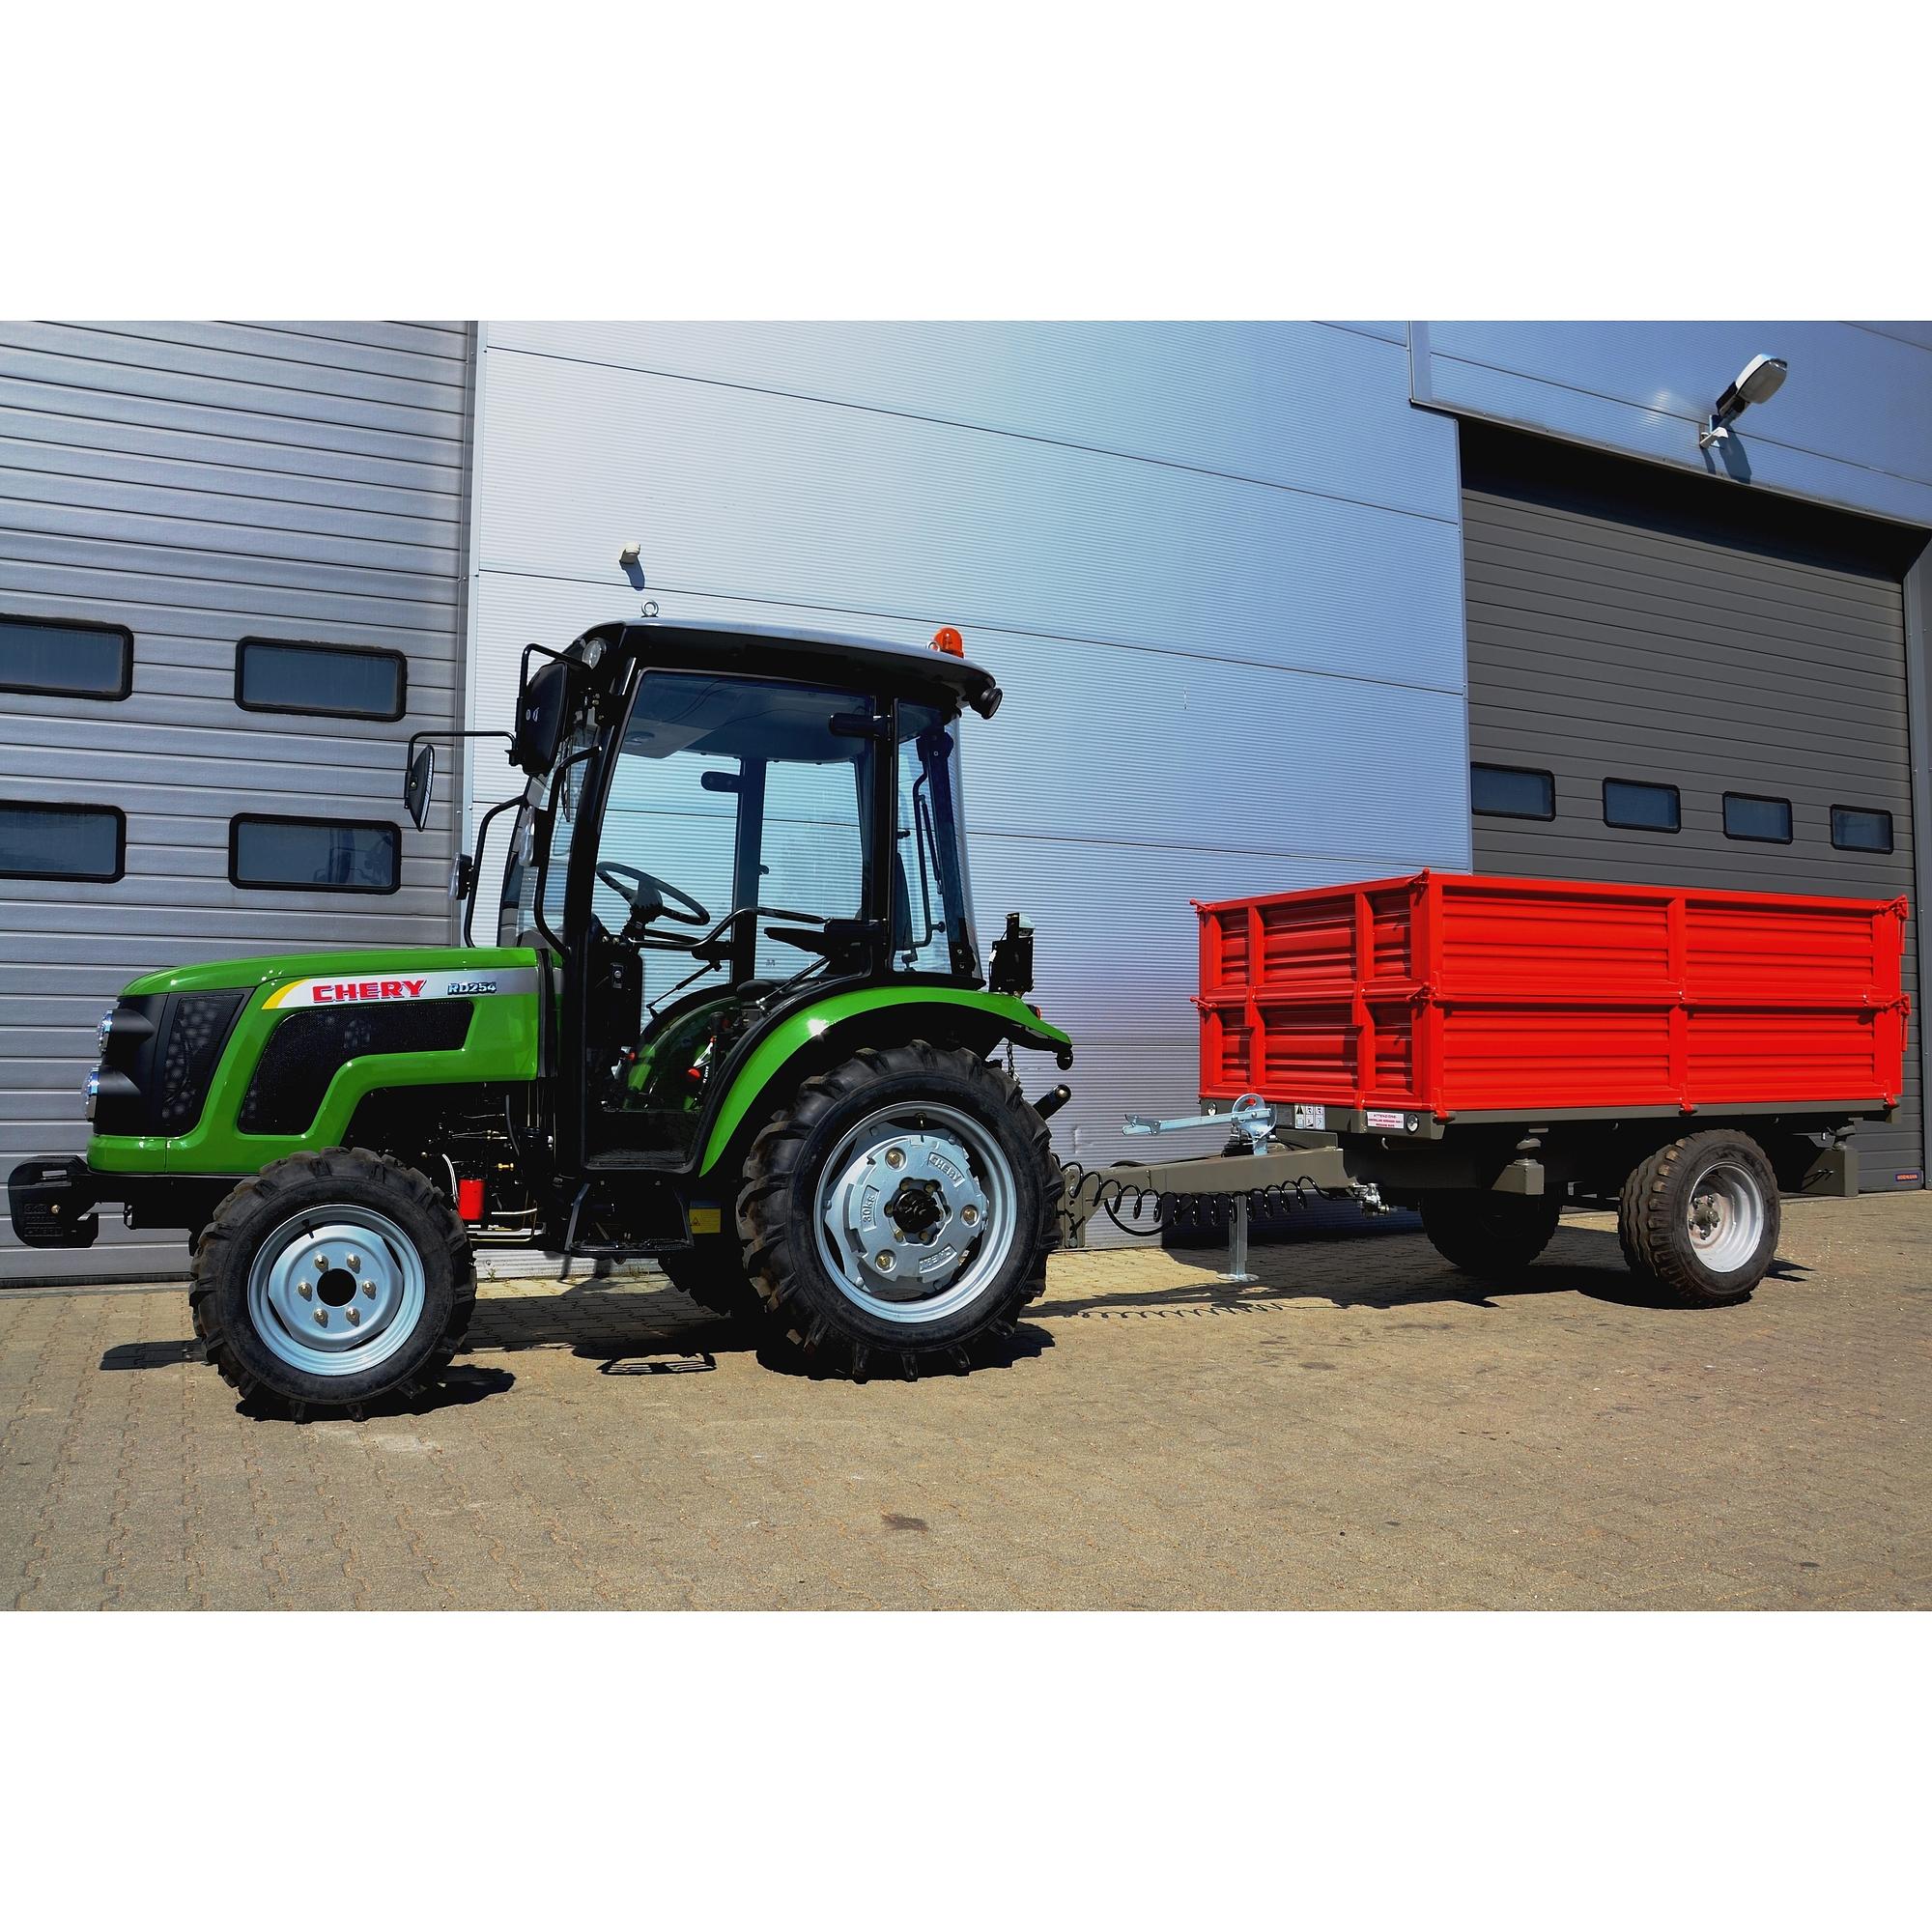 zoomlion-traktor-25-le-fulkes-rd254-12